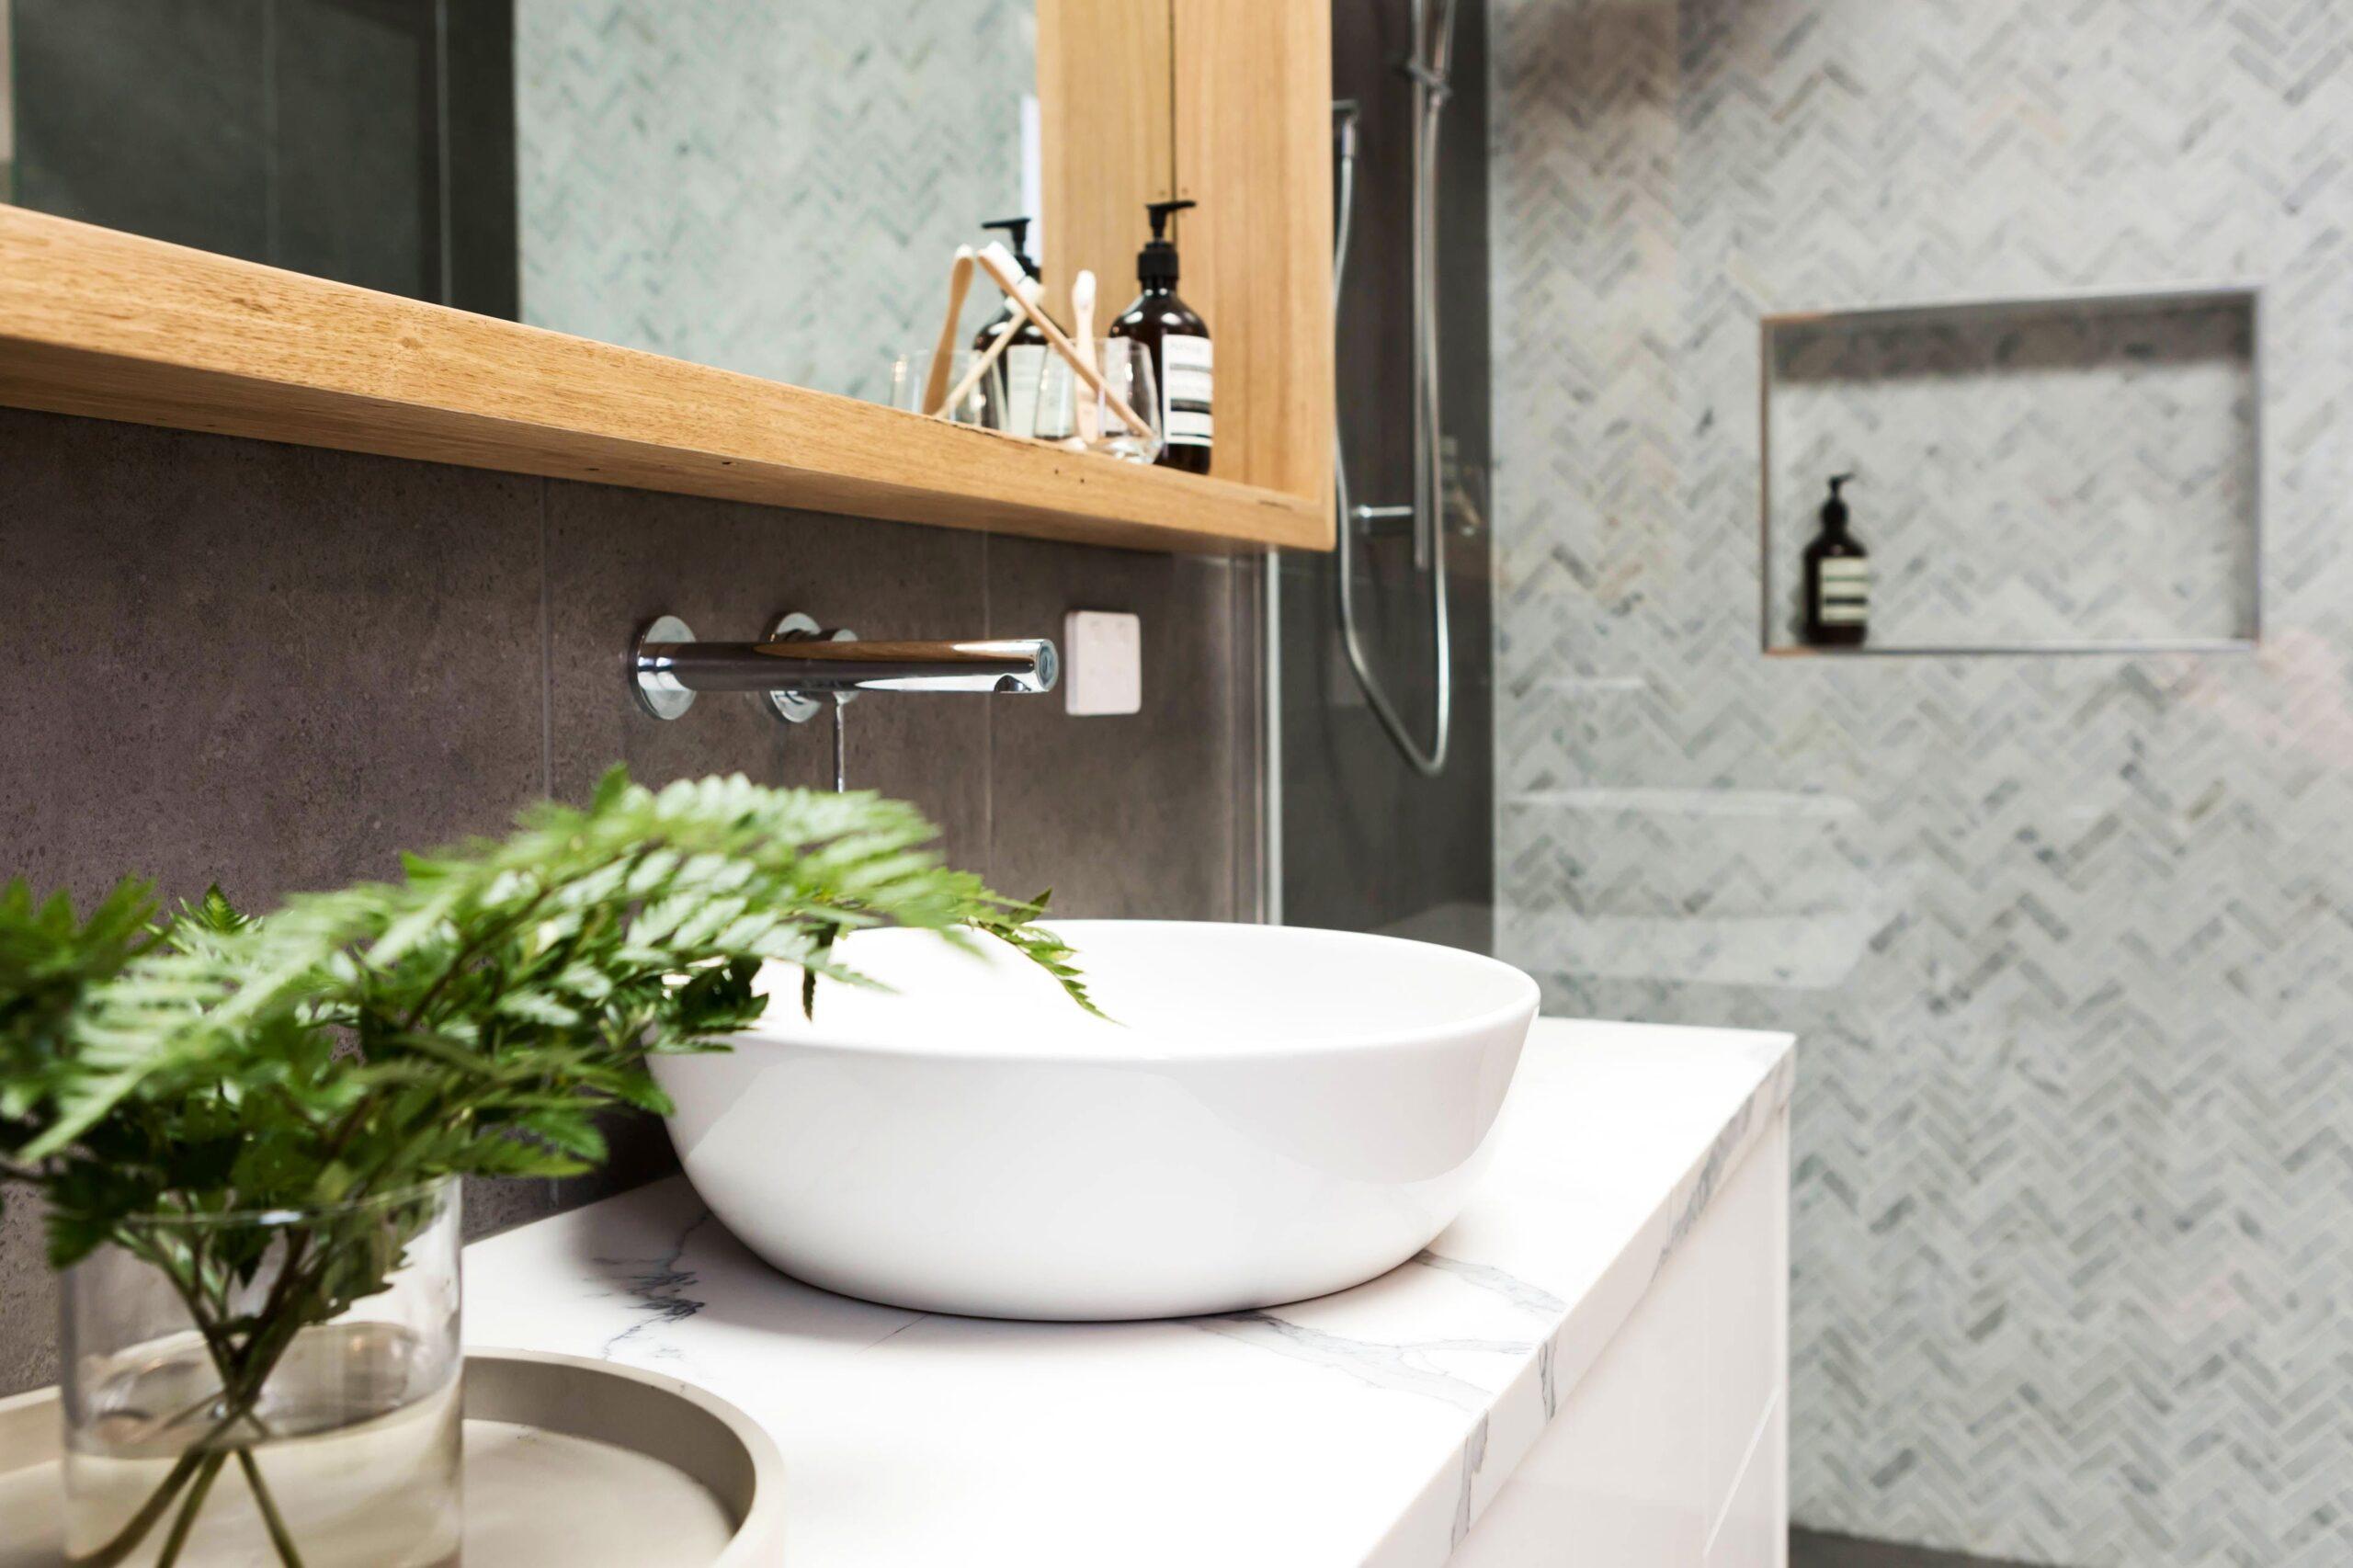 Image of rsz istock 675494586 2 scaled in Quartz Vs. Marble vanity countertops - Cosentino